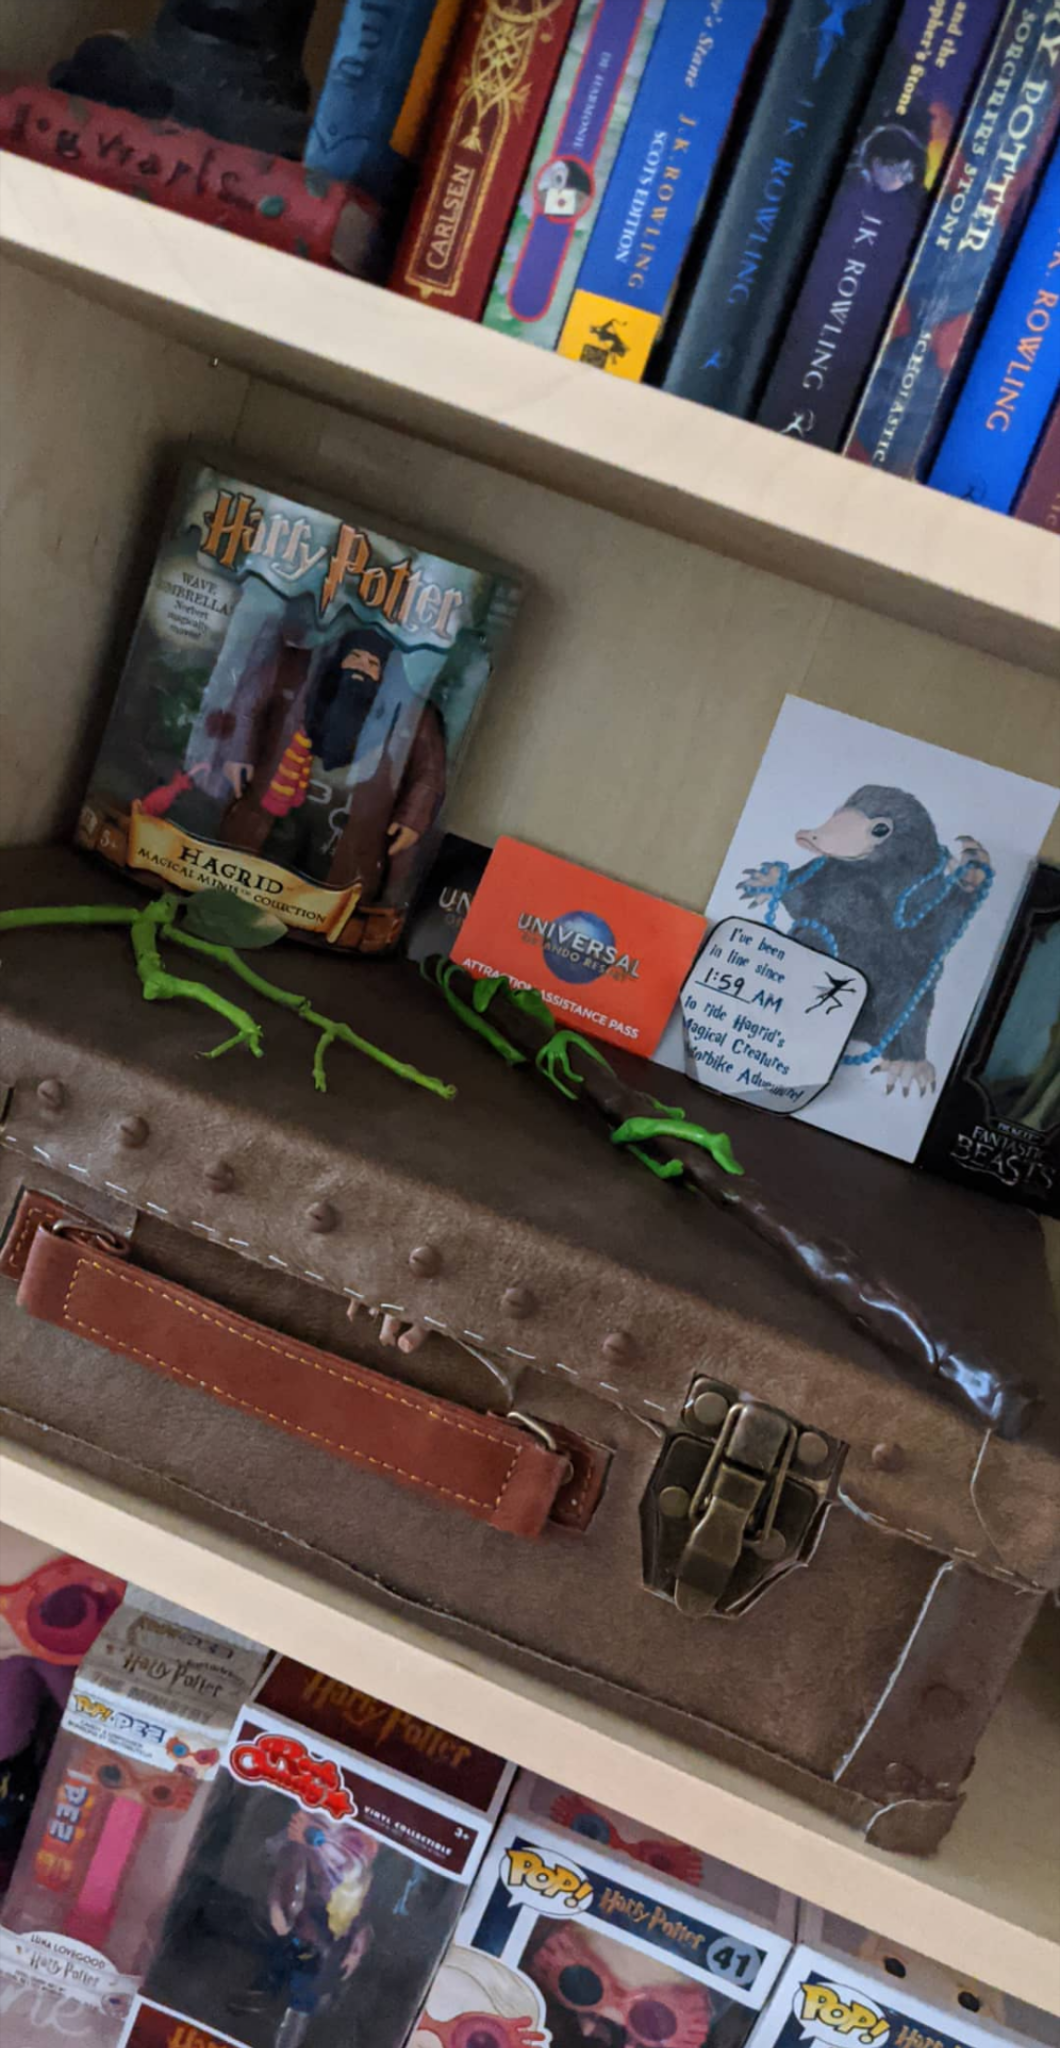 Shelf photo